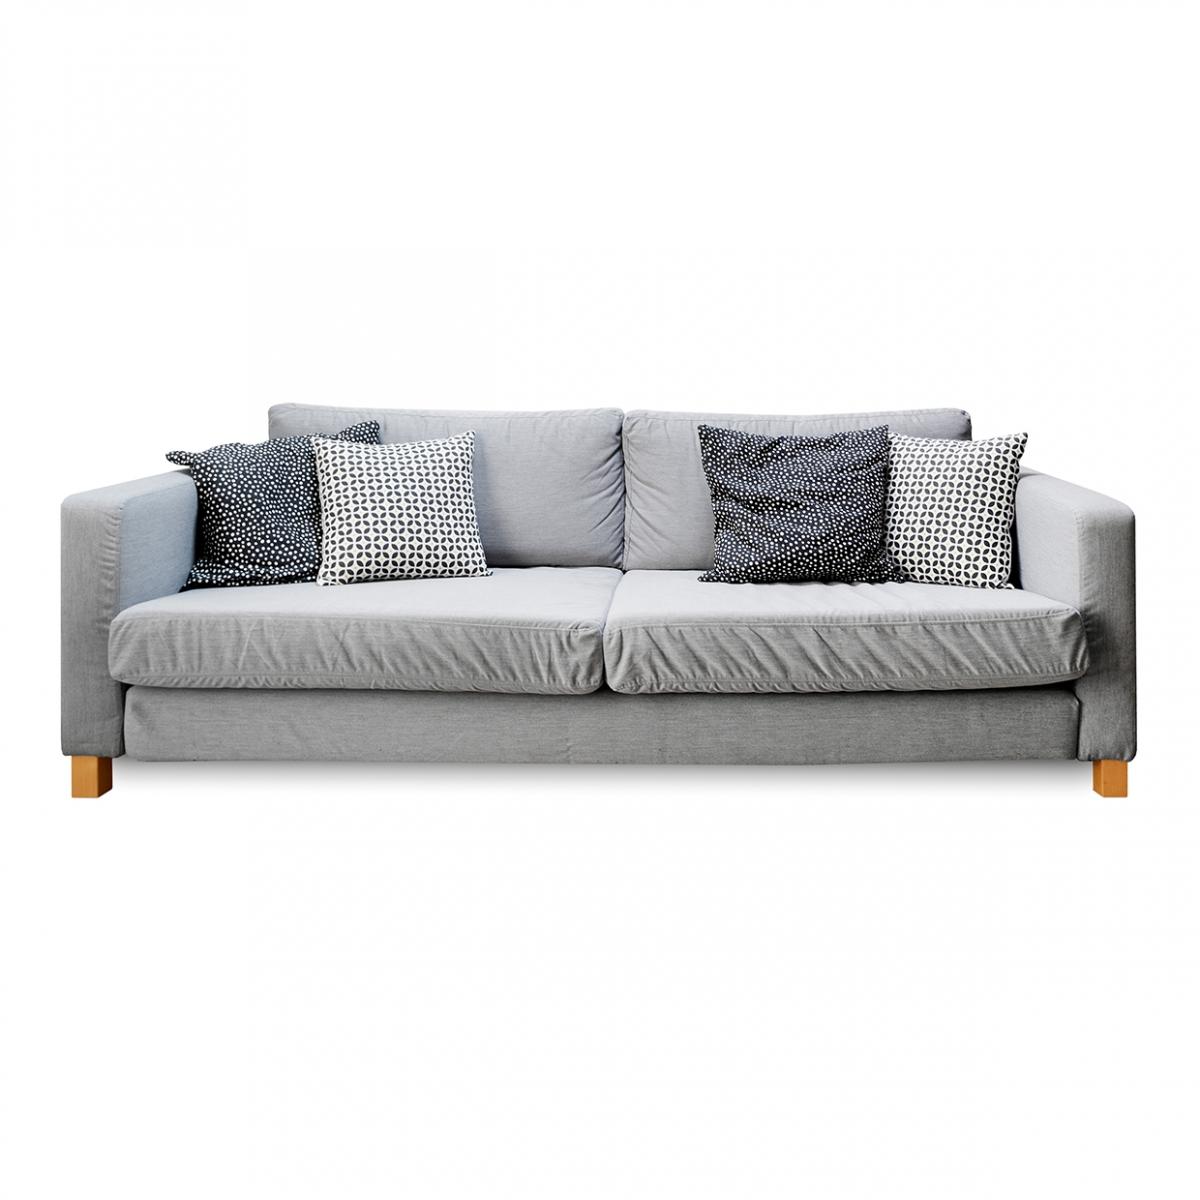 Imagen en la que se ve un sofá